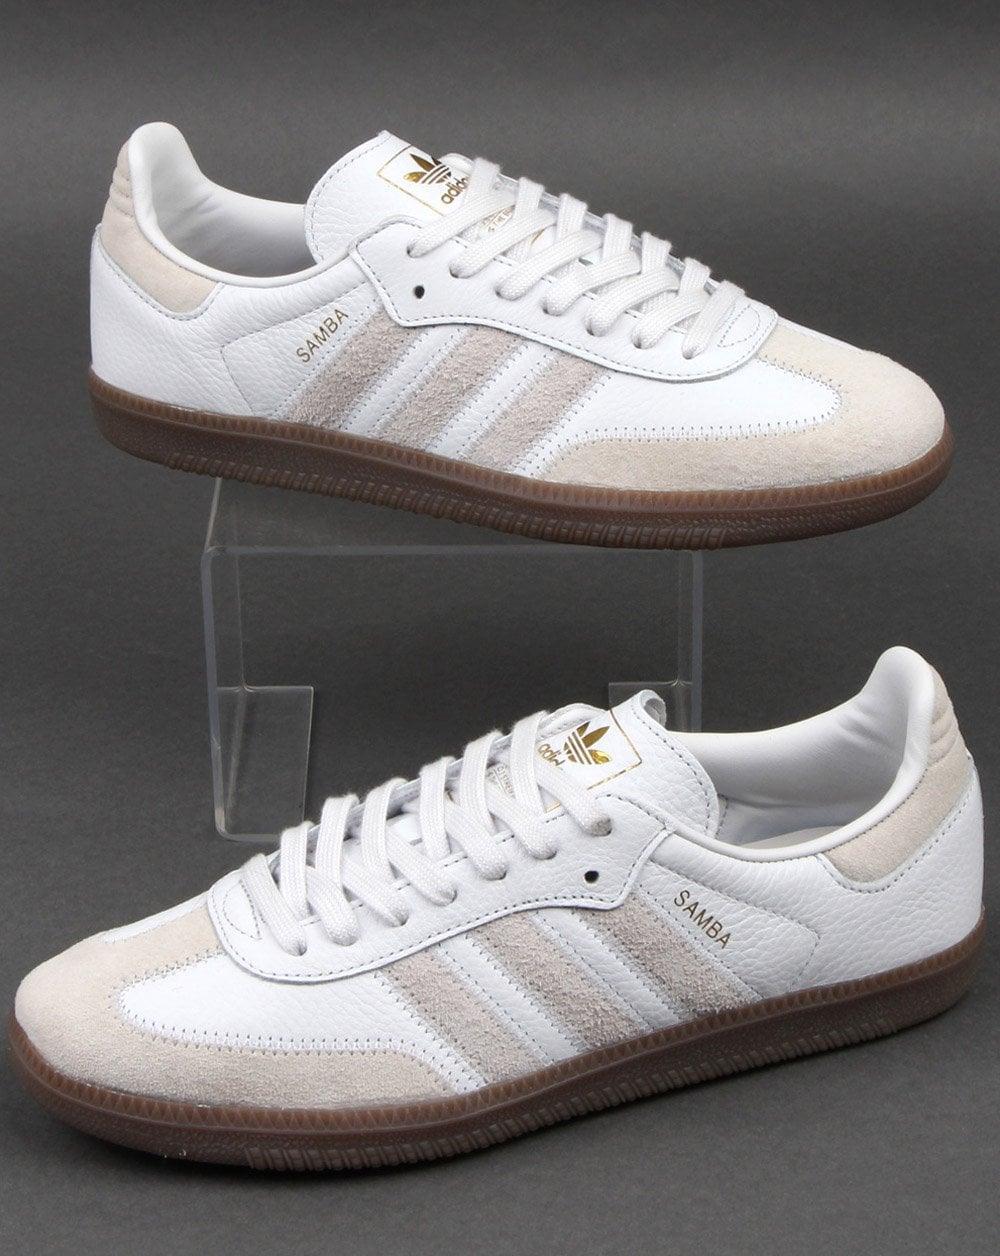 Repeler emoción conservador  Adidas, Samba, Og, Leather, Trainers, Crystal White | 80s casuals